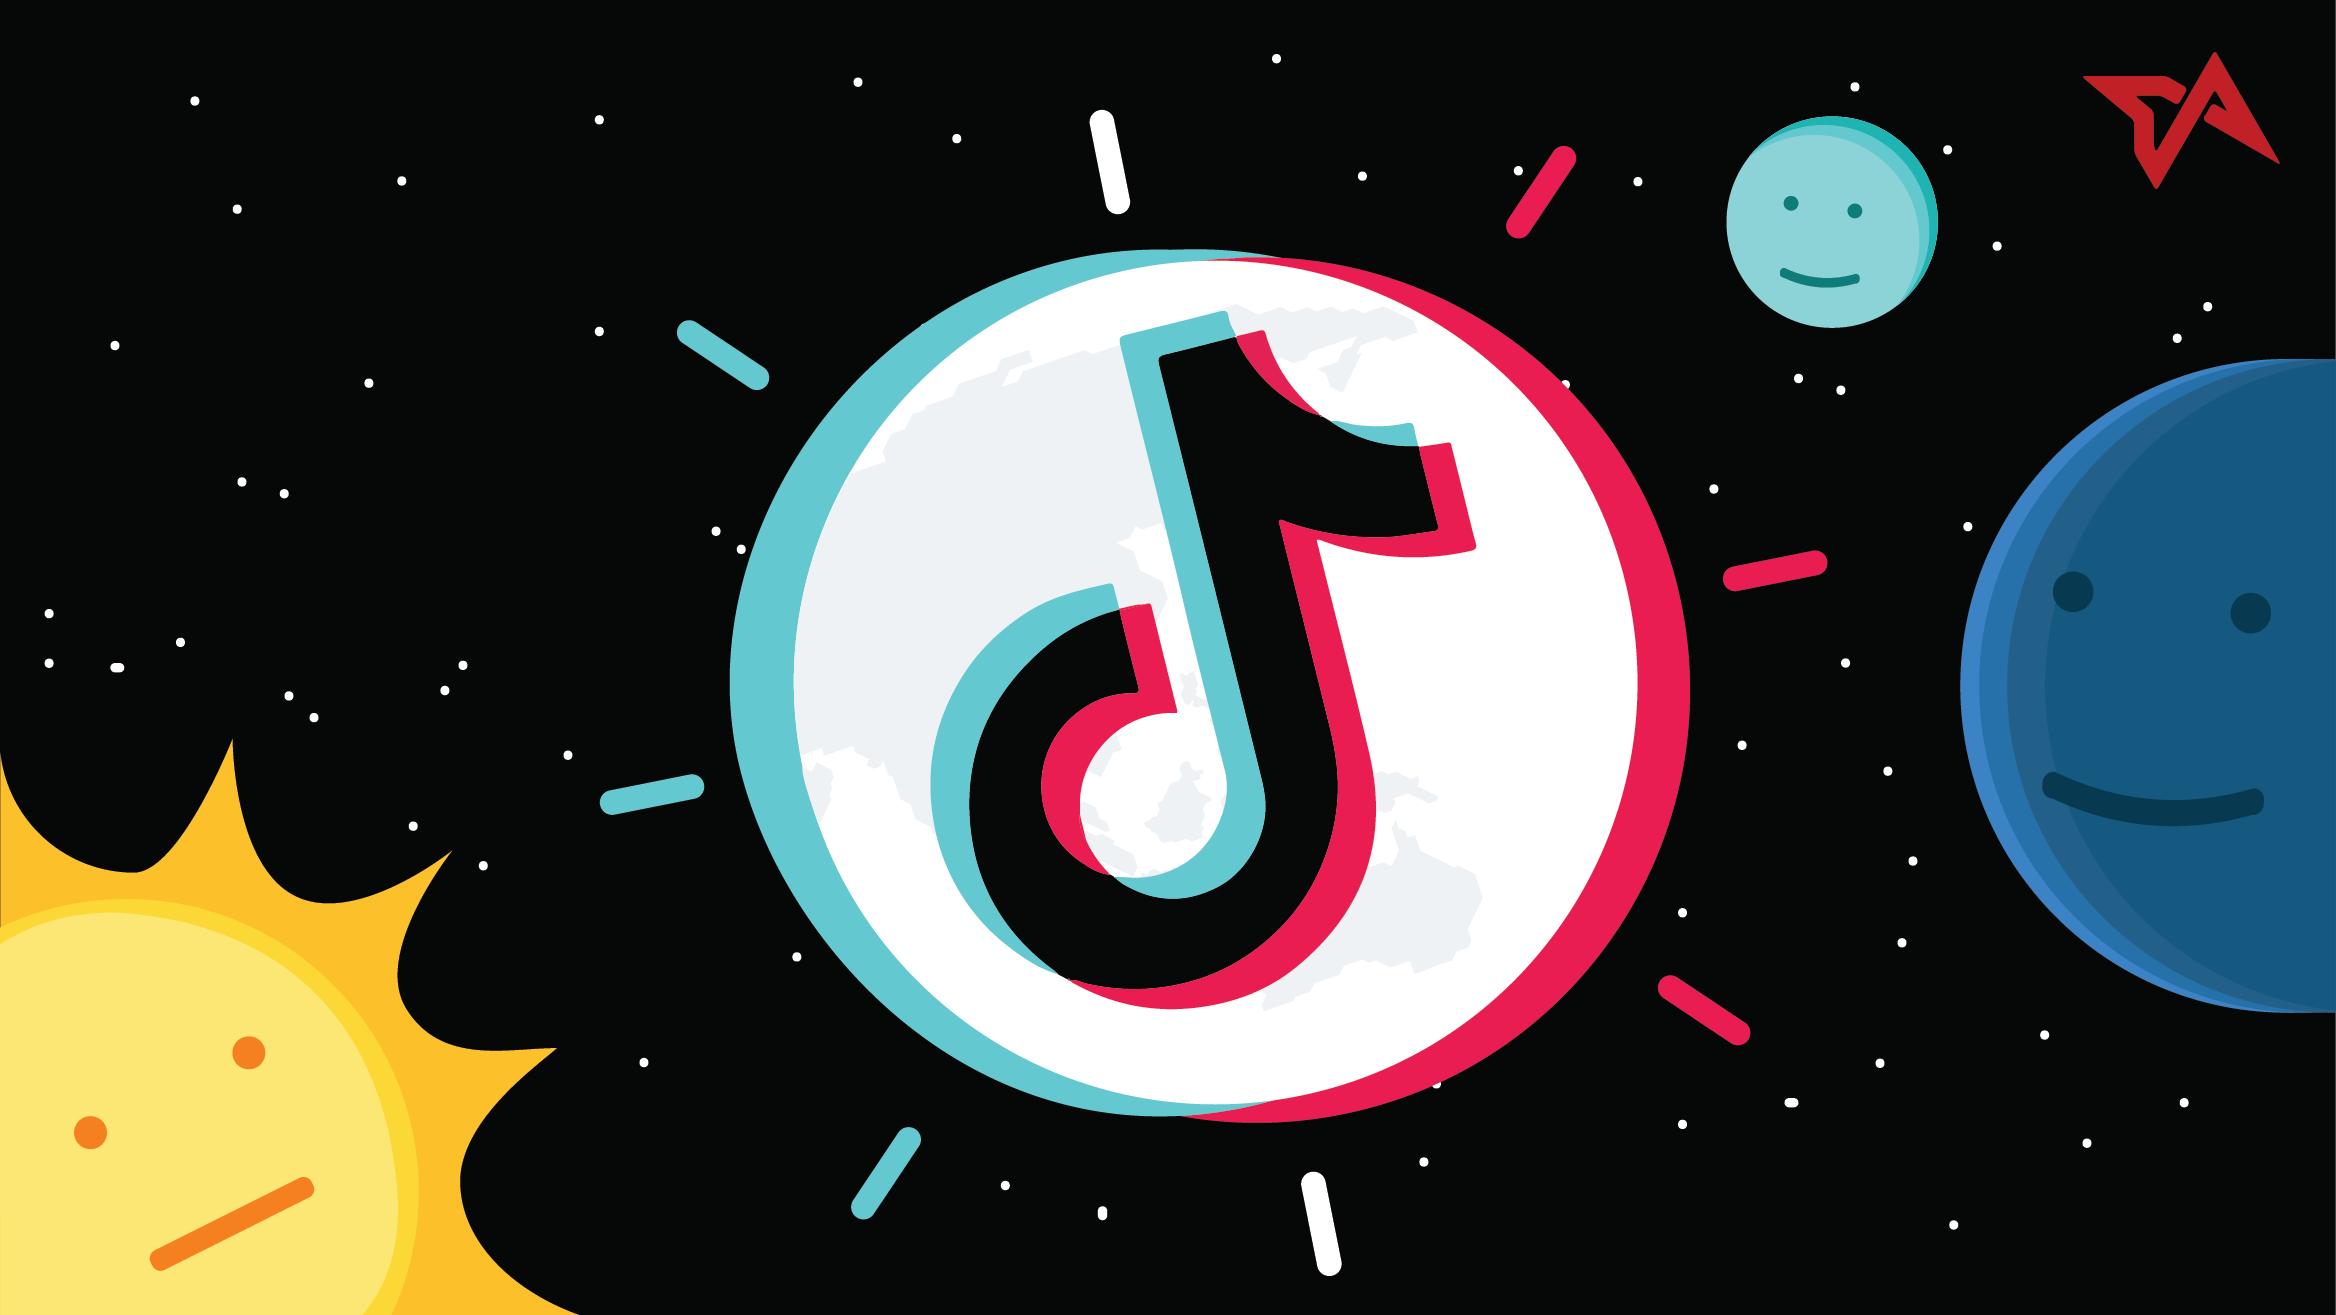 TikTok Surpassed Facebook, Instagram, Snapchat & YouTube In Downloads